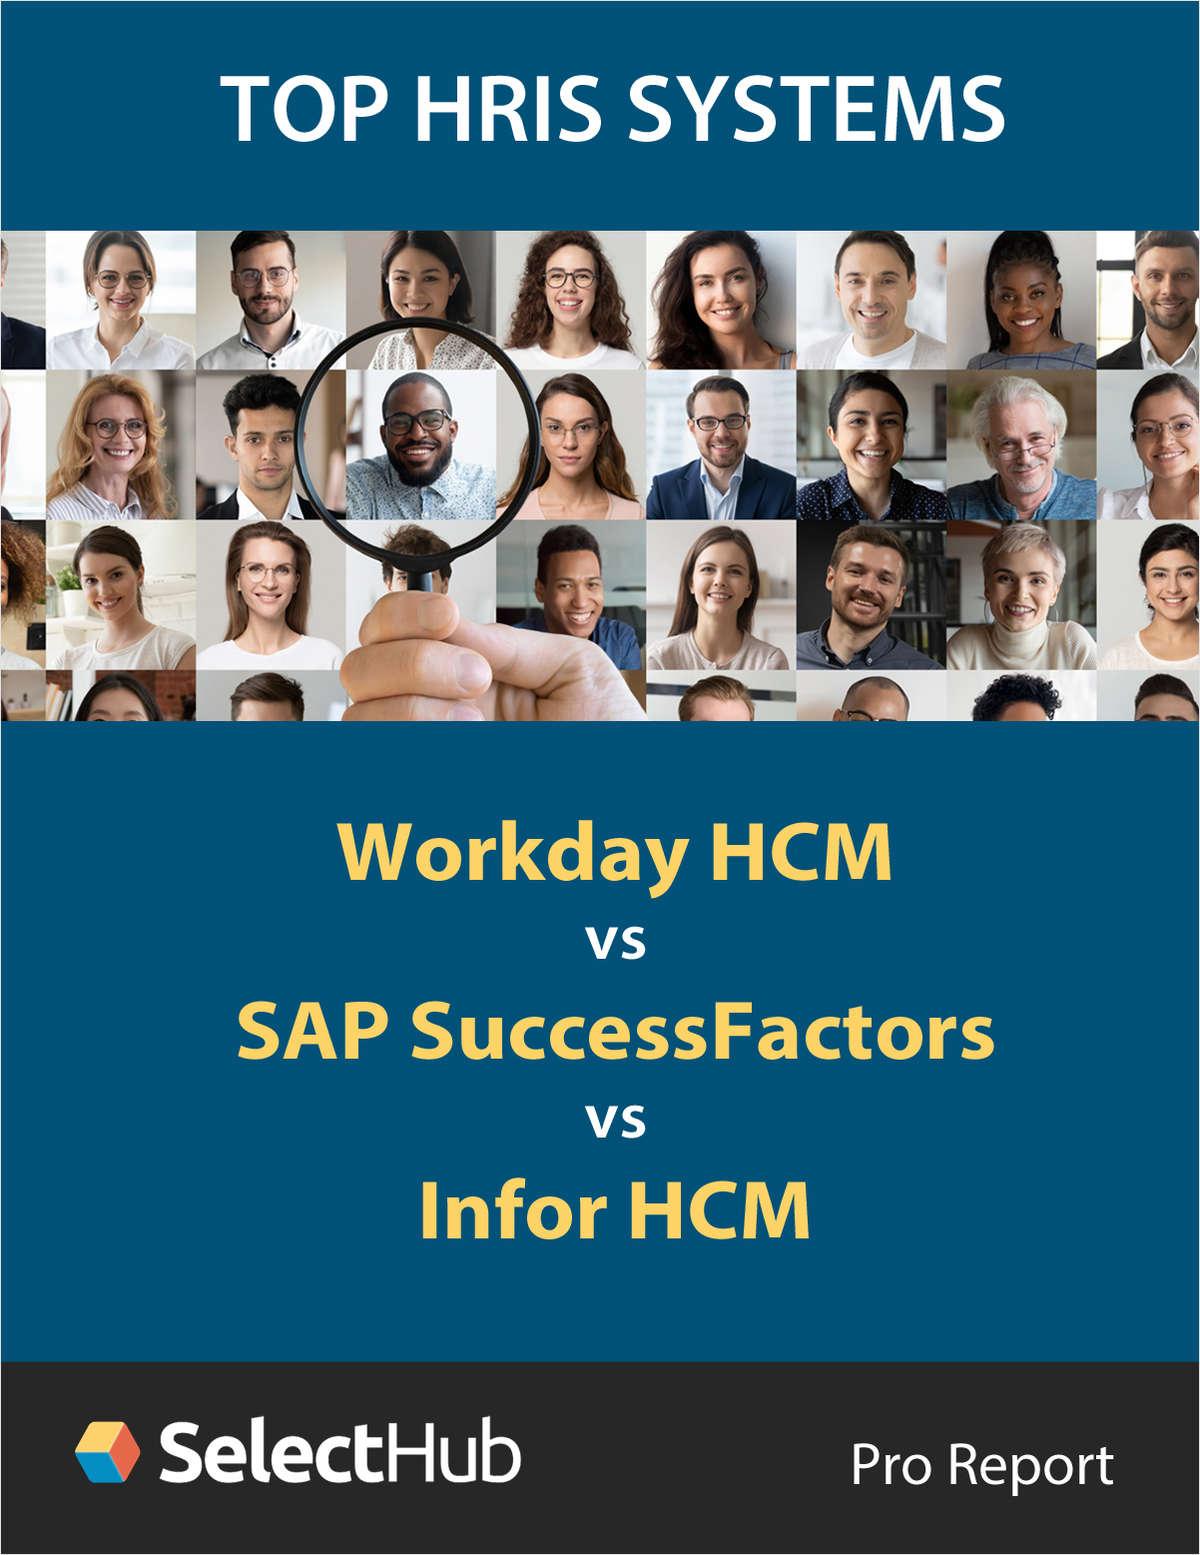 Top HCM Software 2021: Infor HCM vs SAP SuccessFactors vs Workday HCM